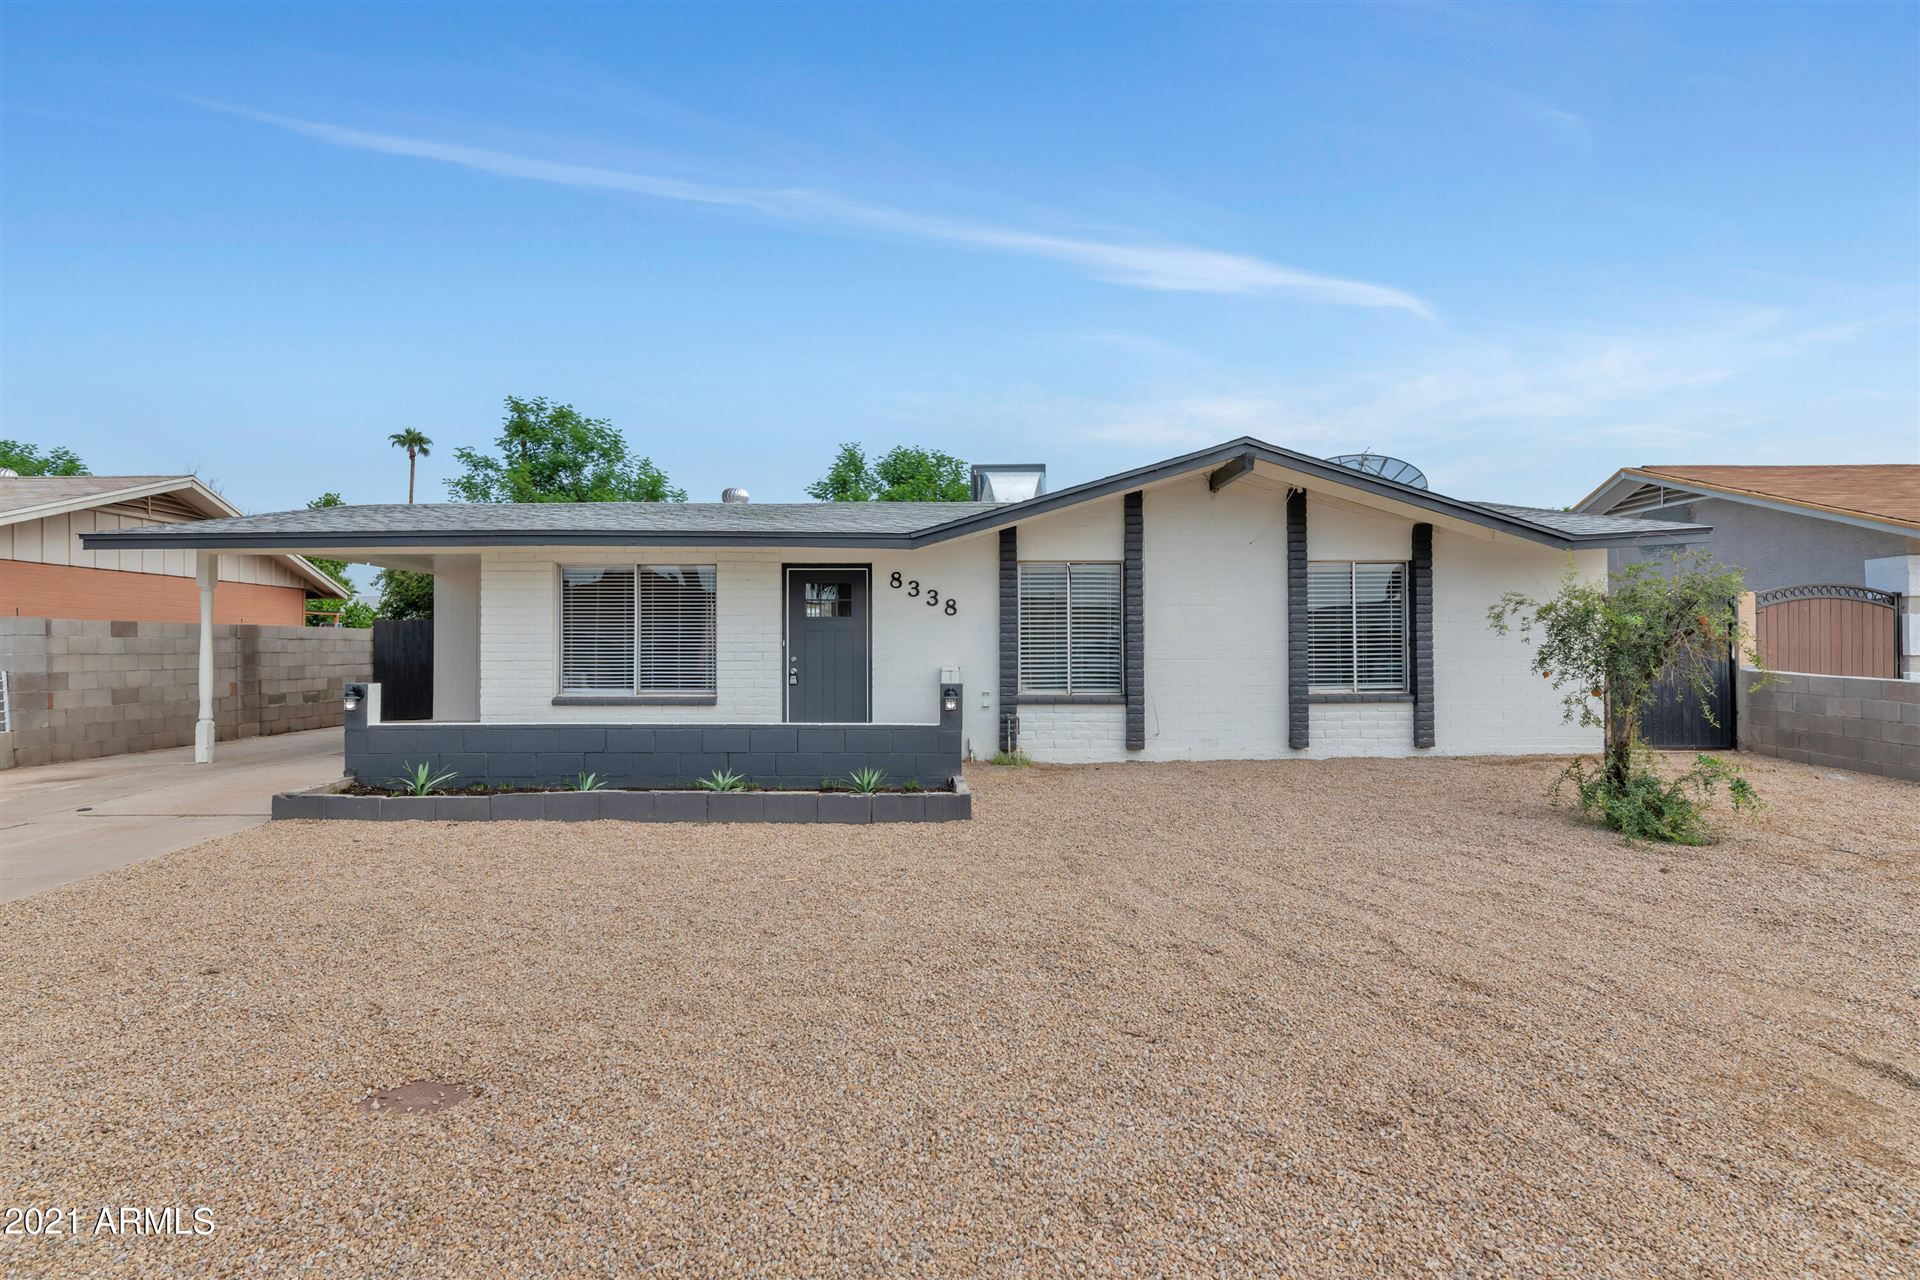 8338 W GLENROSA Avenue, Phoenix, AZ 85037 - MLS#: 6289193